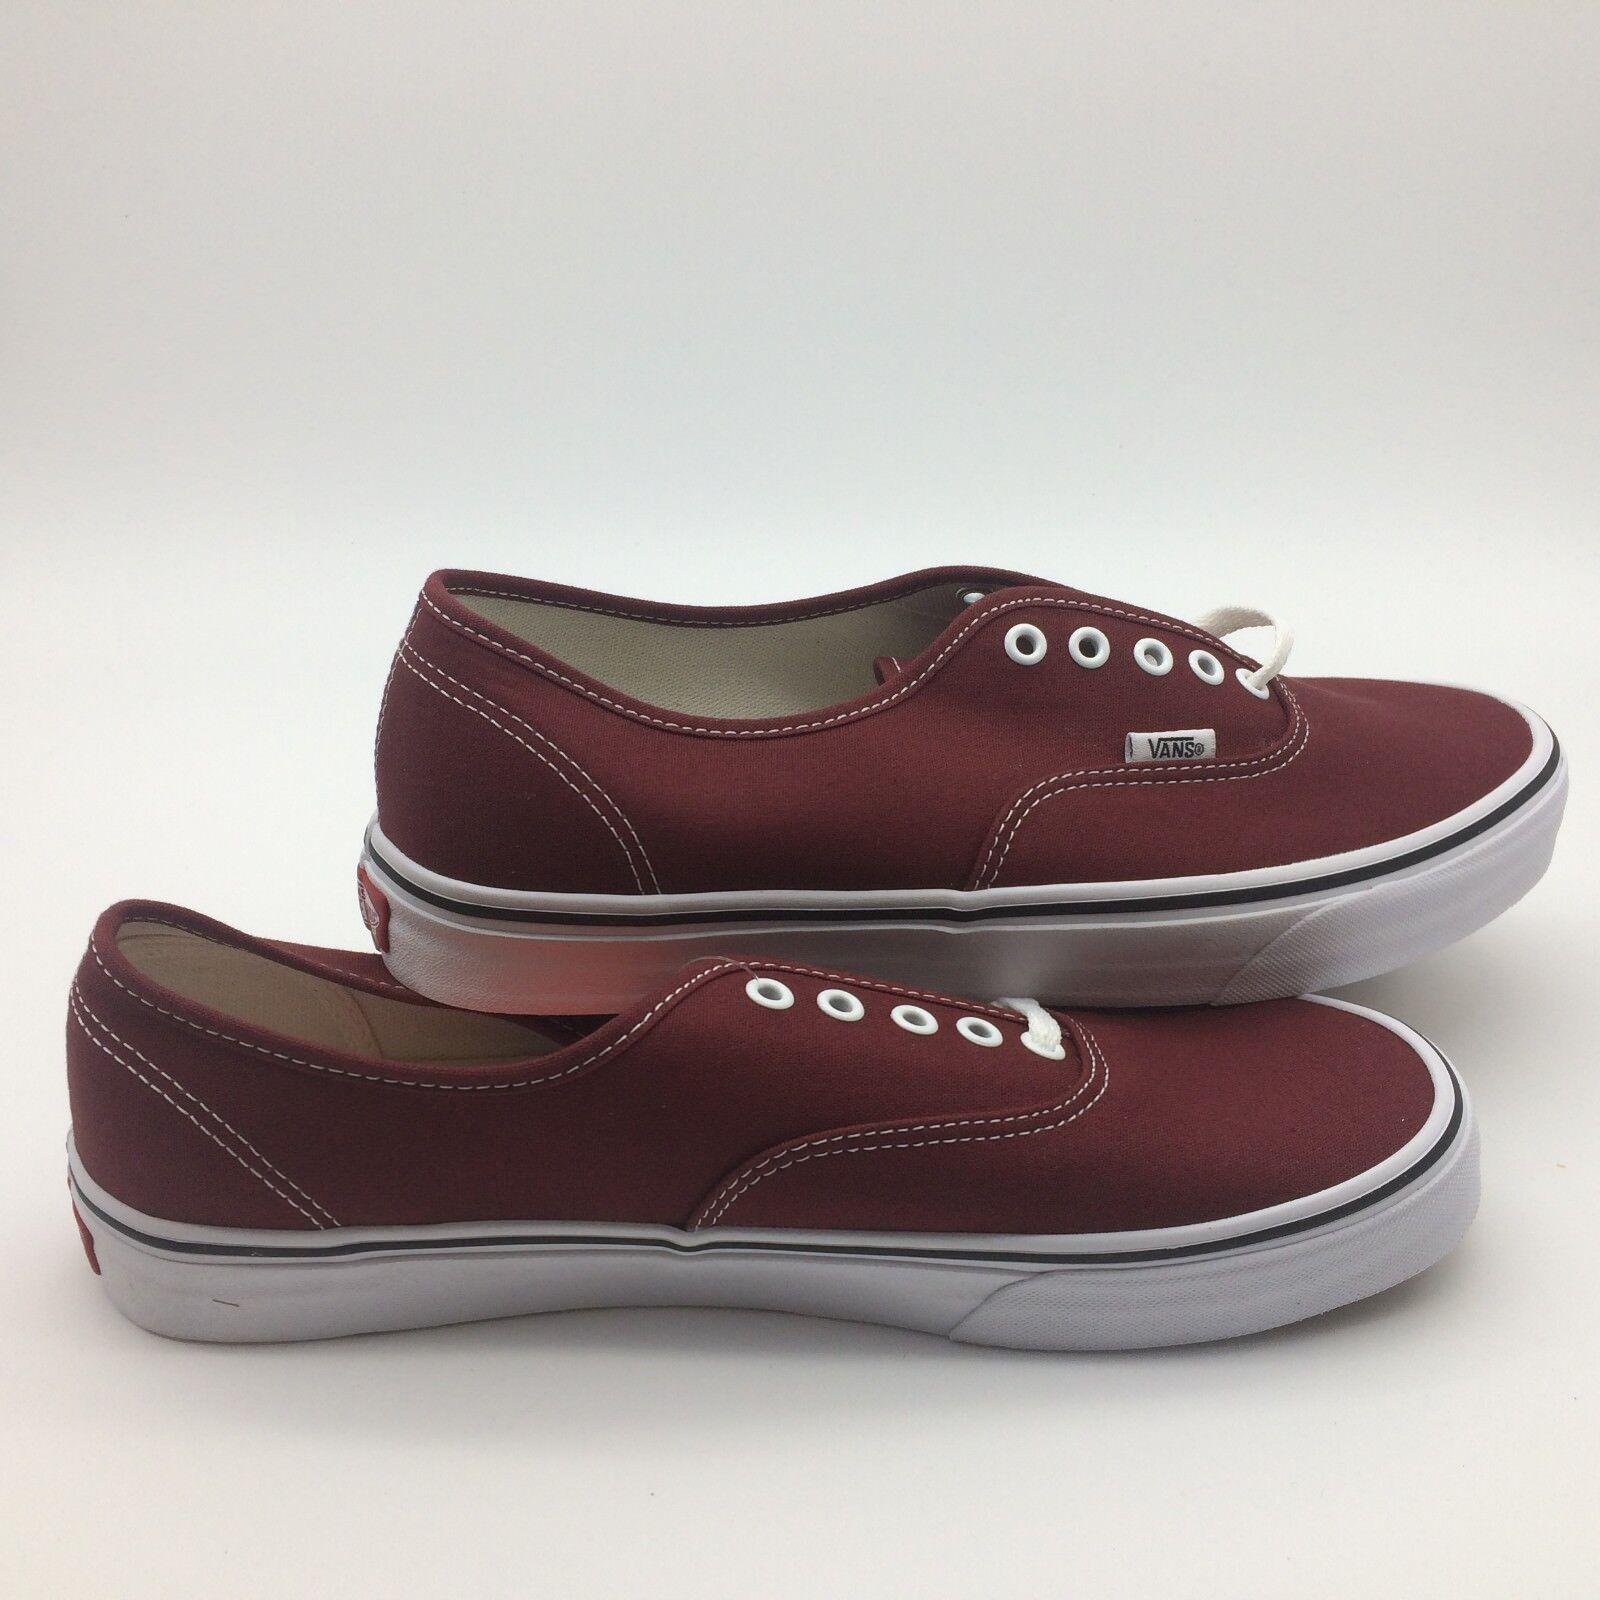 Vans Men's shoes's  Authentic''--Madder Brown True White